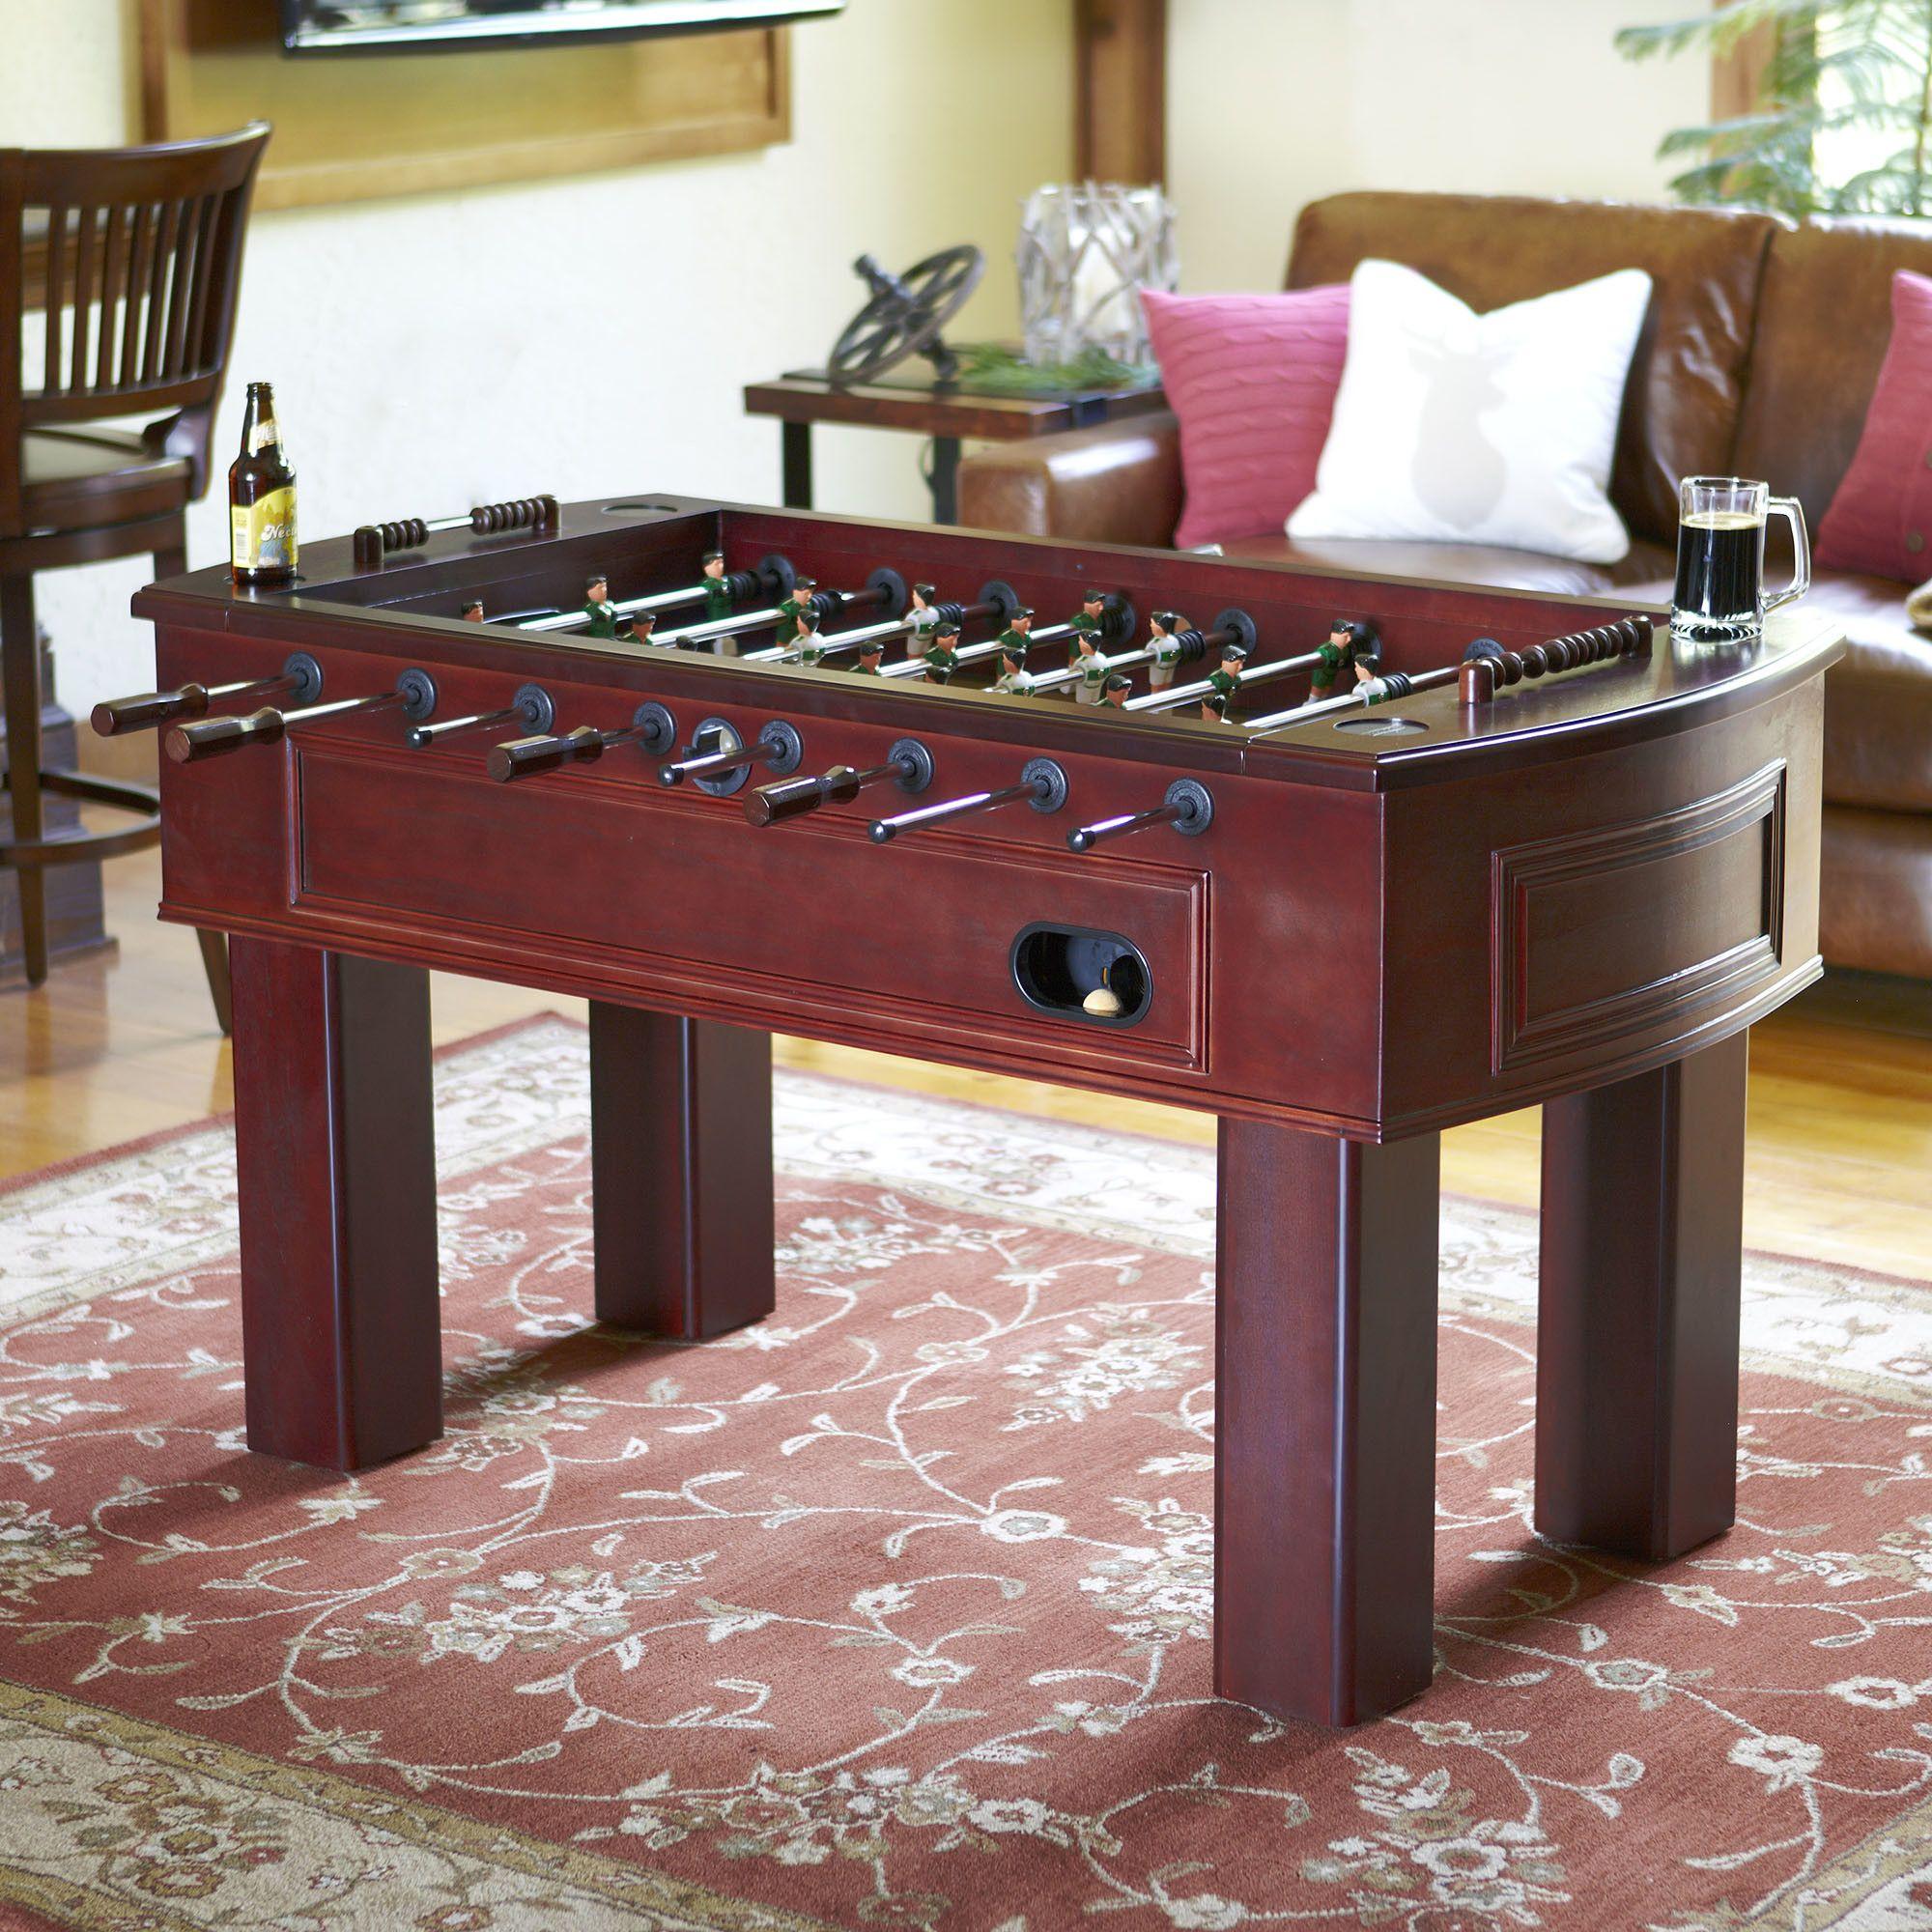 Loftin 62 Wood Foosball Table Foosball Table Foosball Table